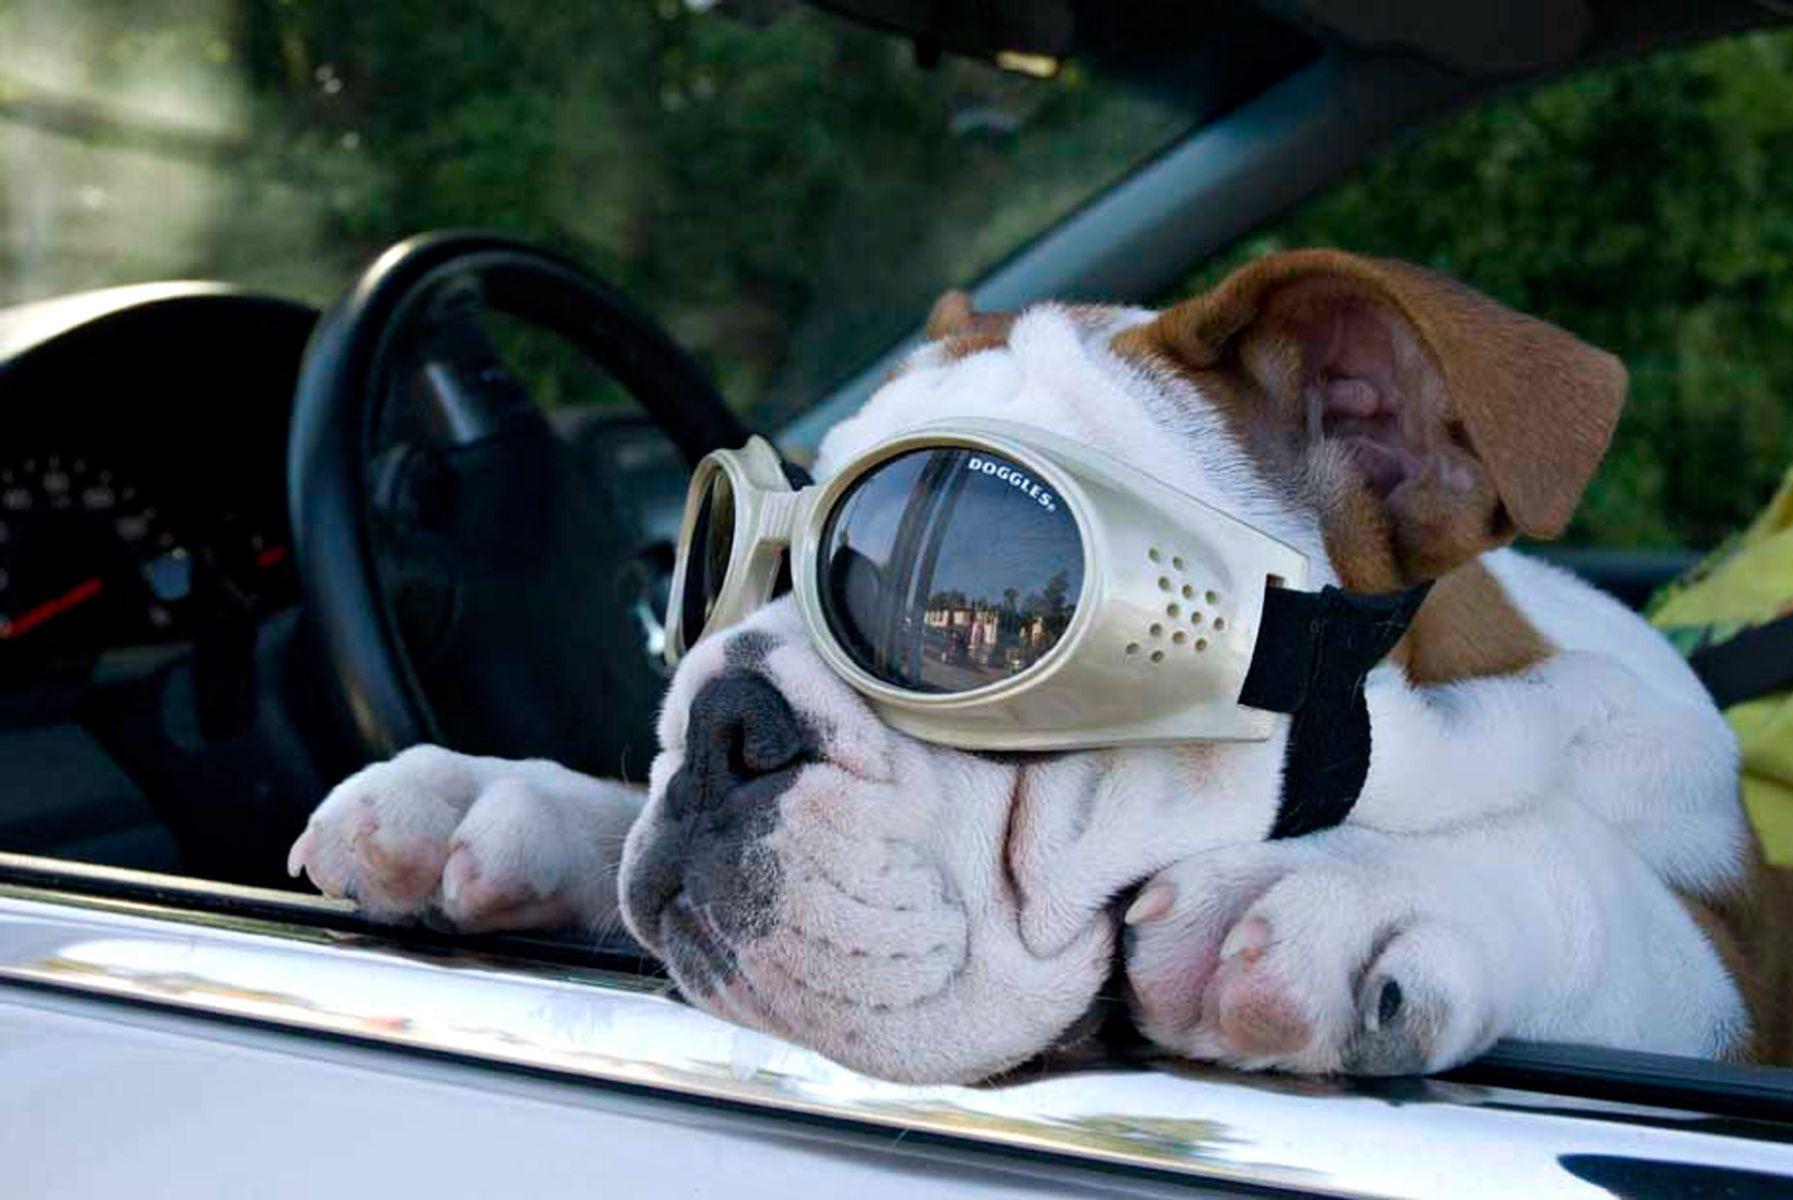 1bulldogpuppy_car158_colorlow